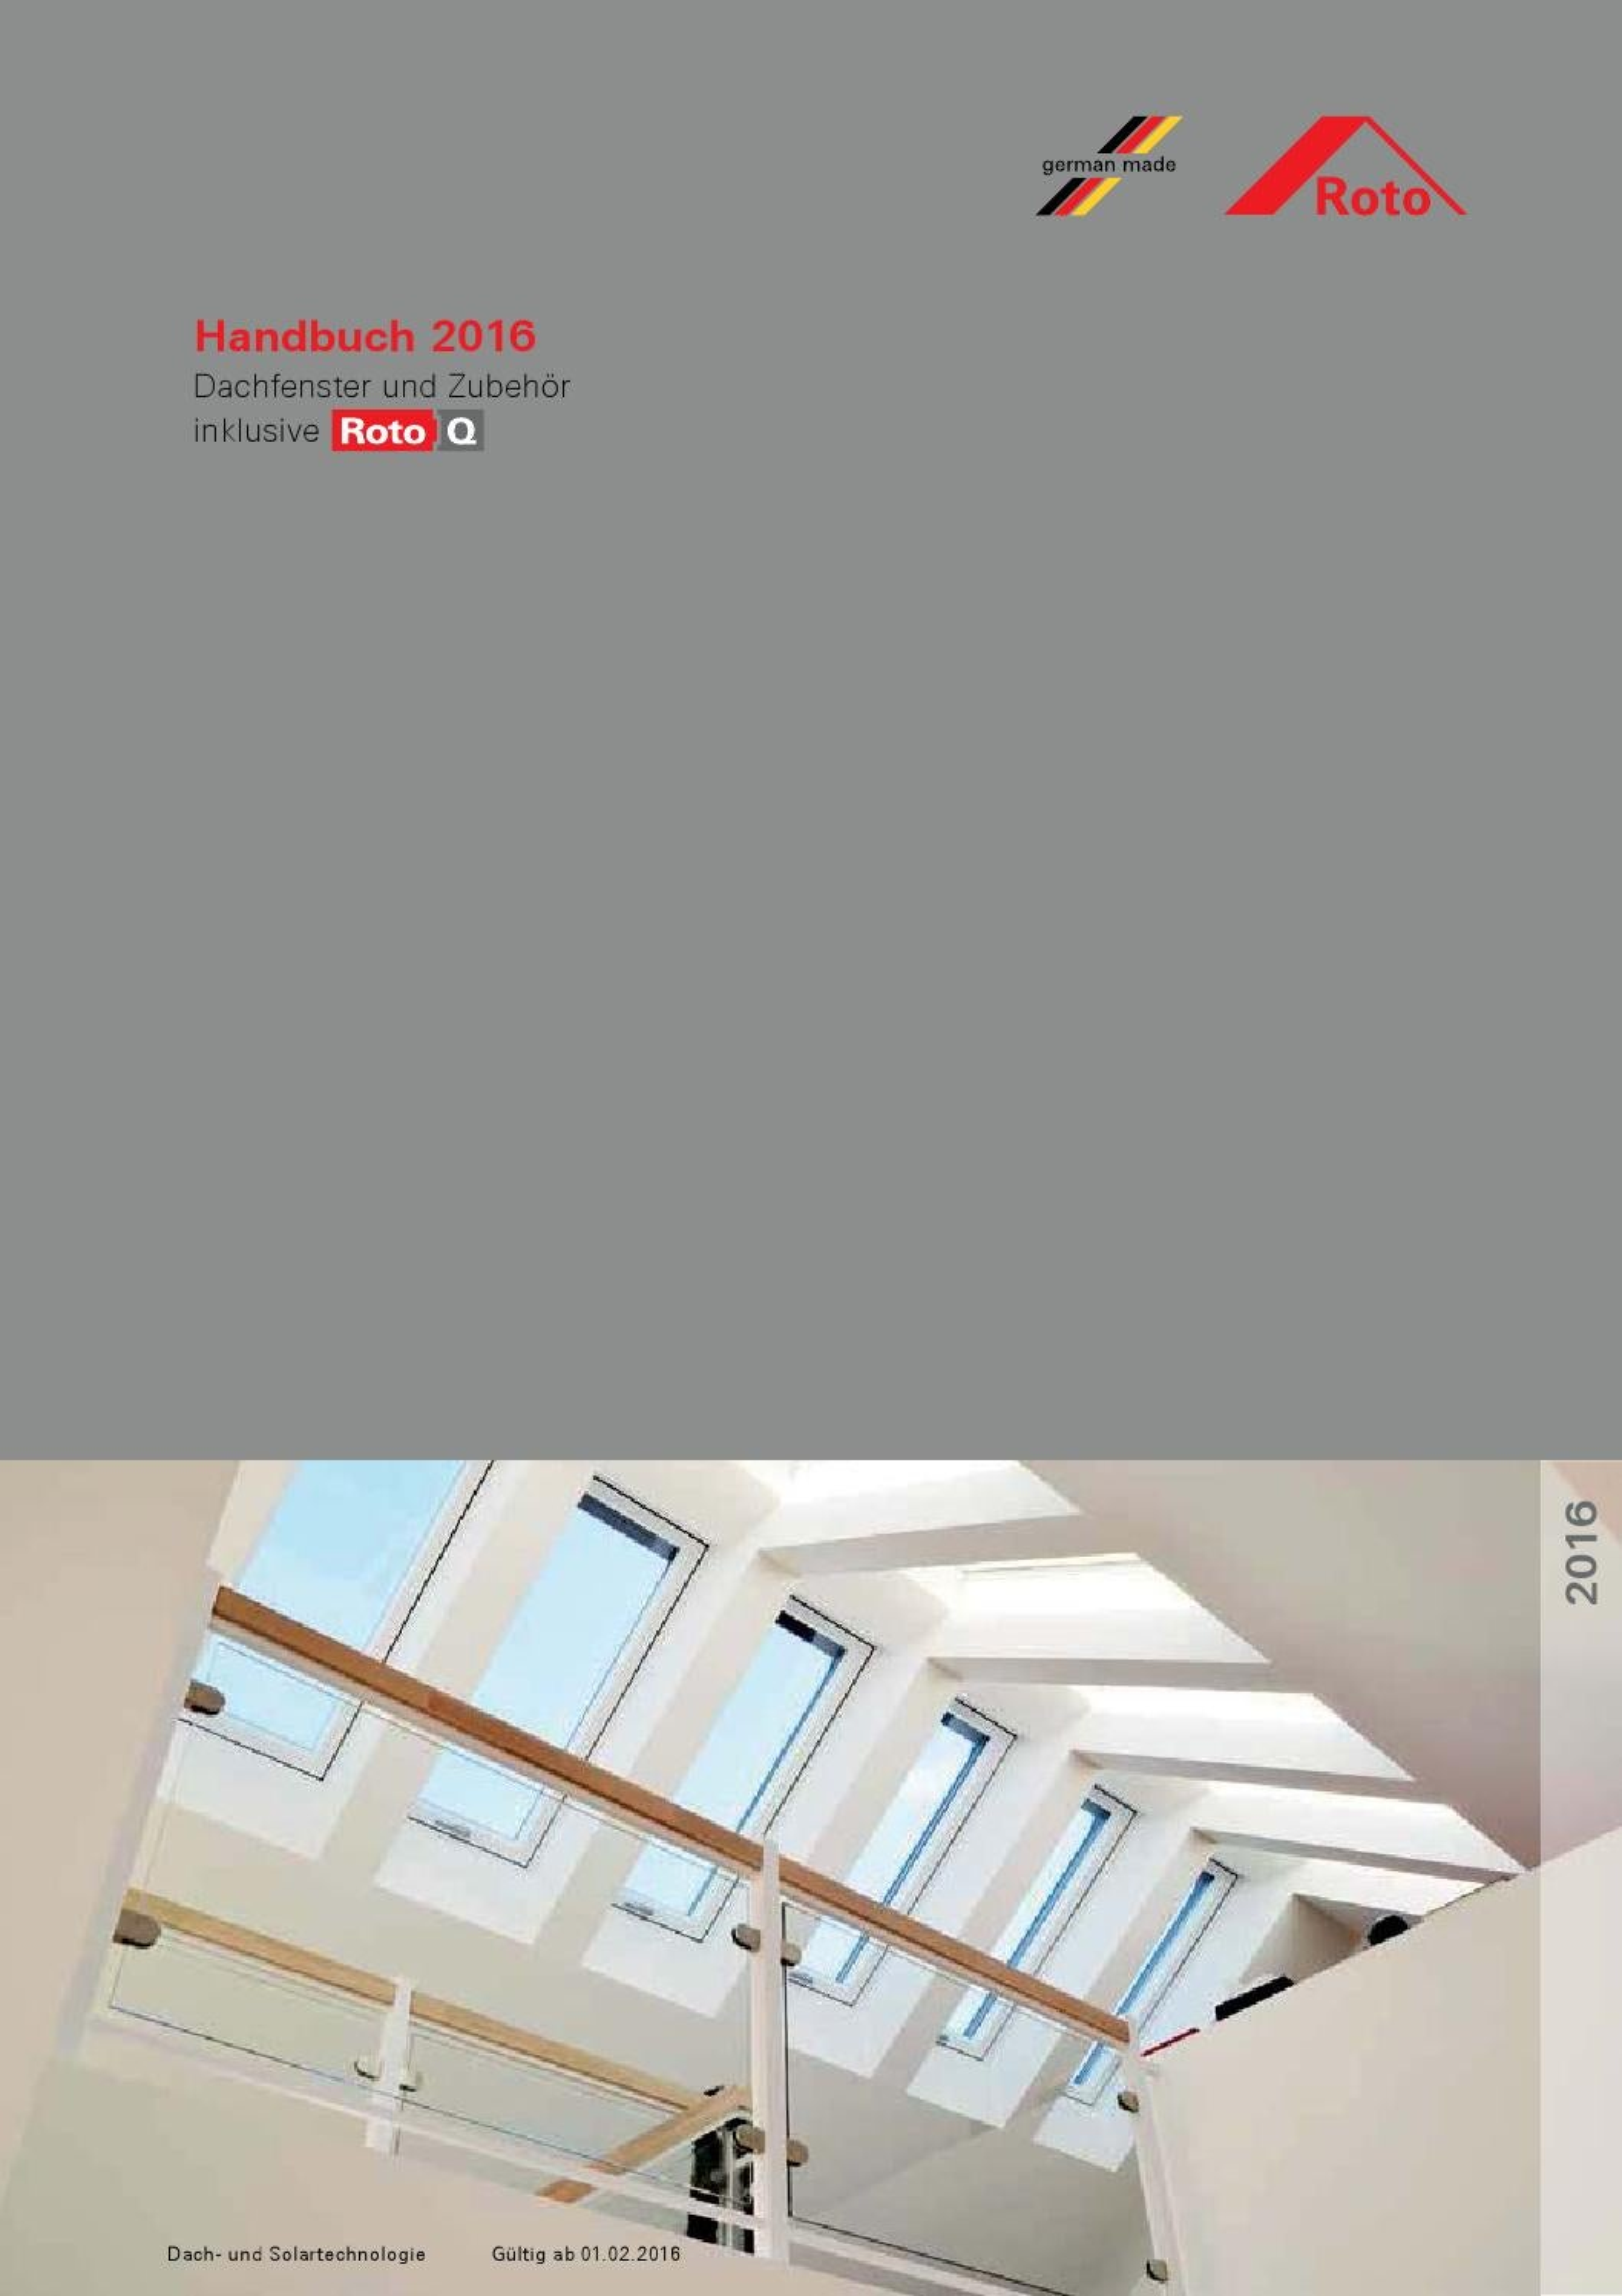 ROTO Handbuch 2016 by Werbeagentur 4c media - issuu